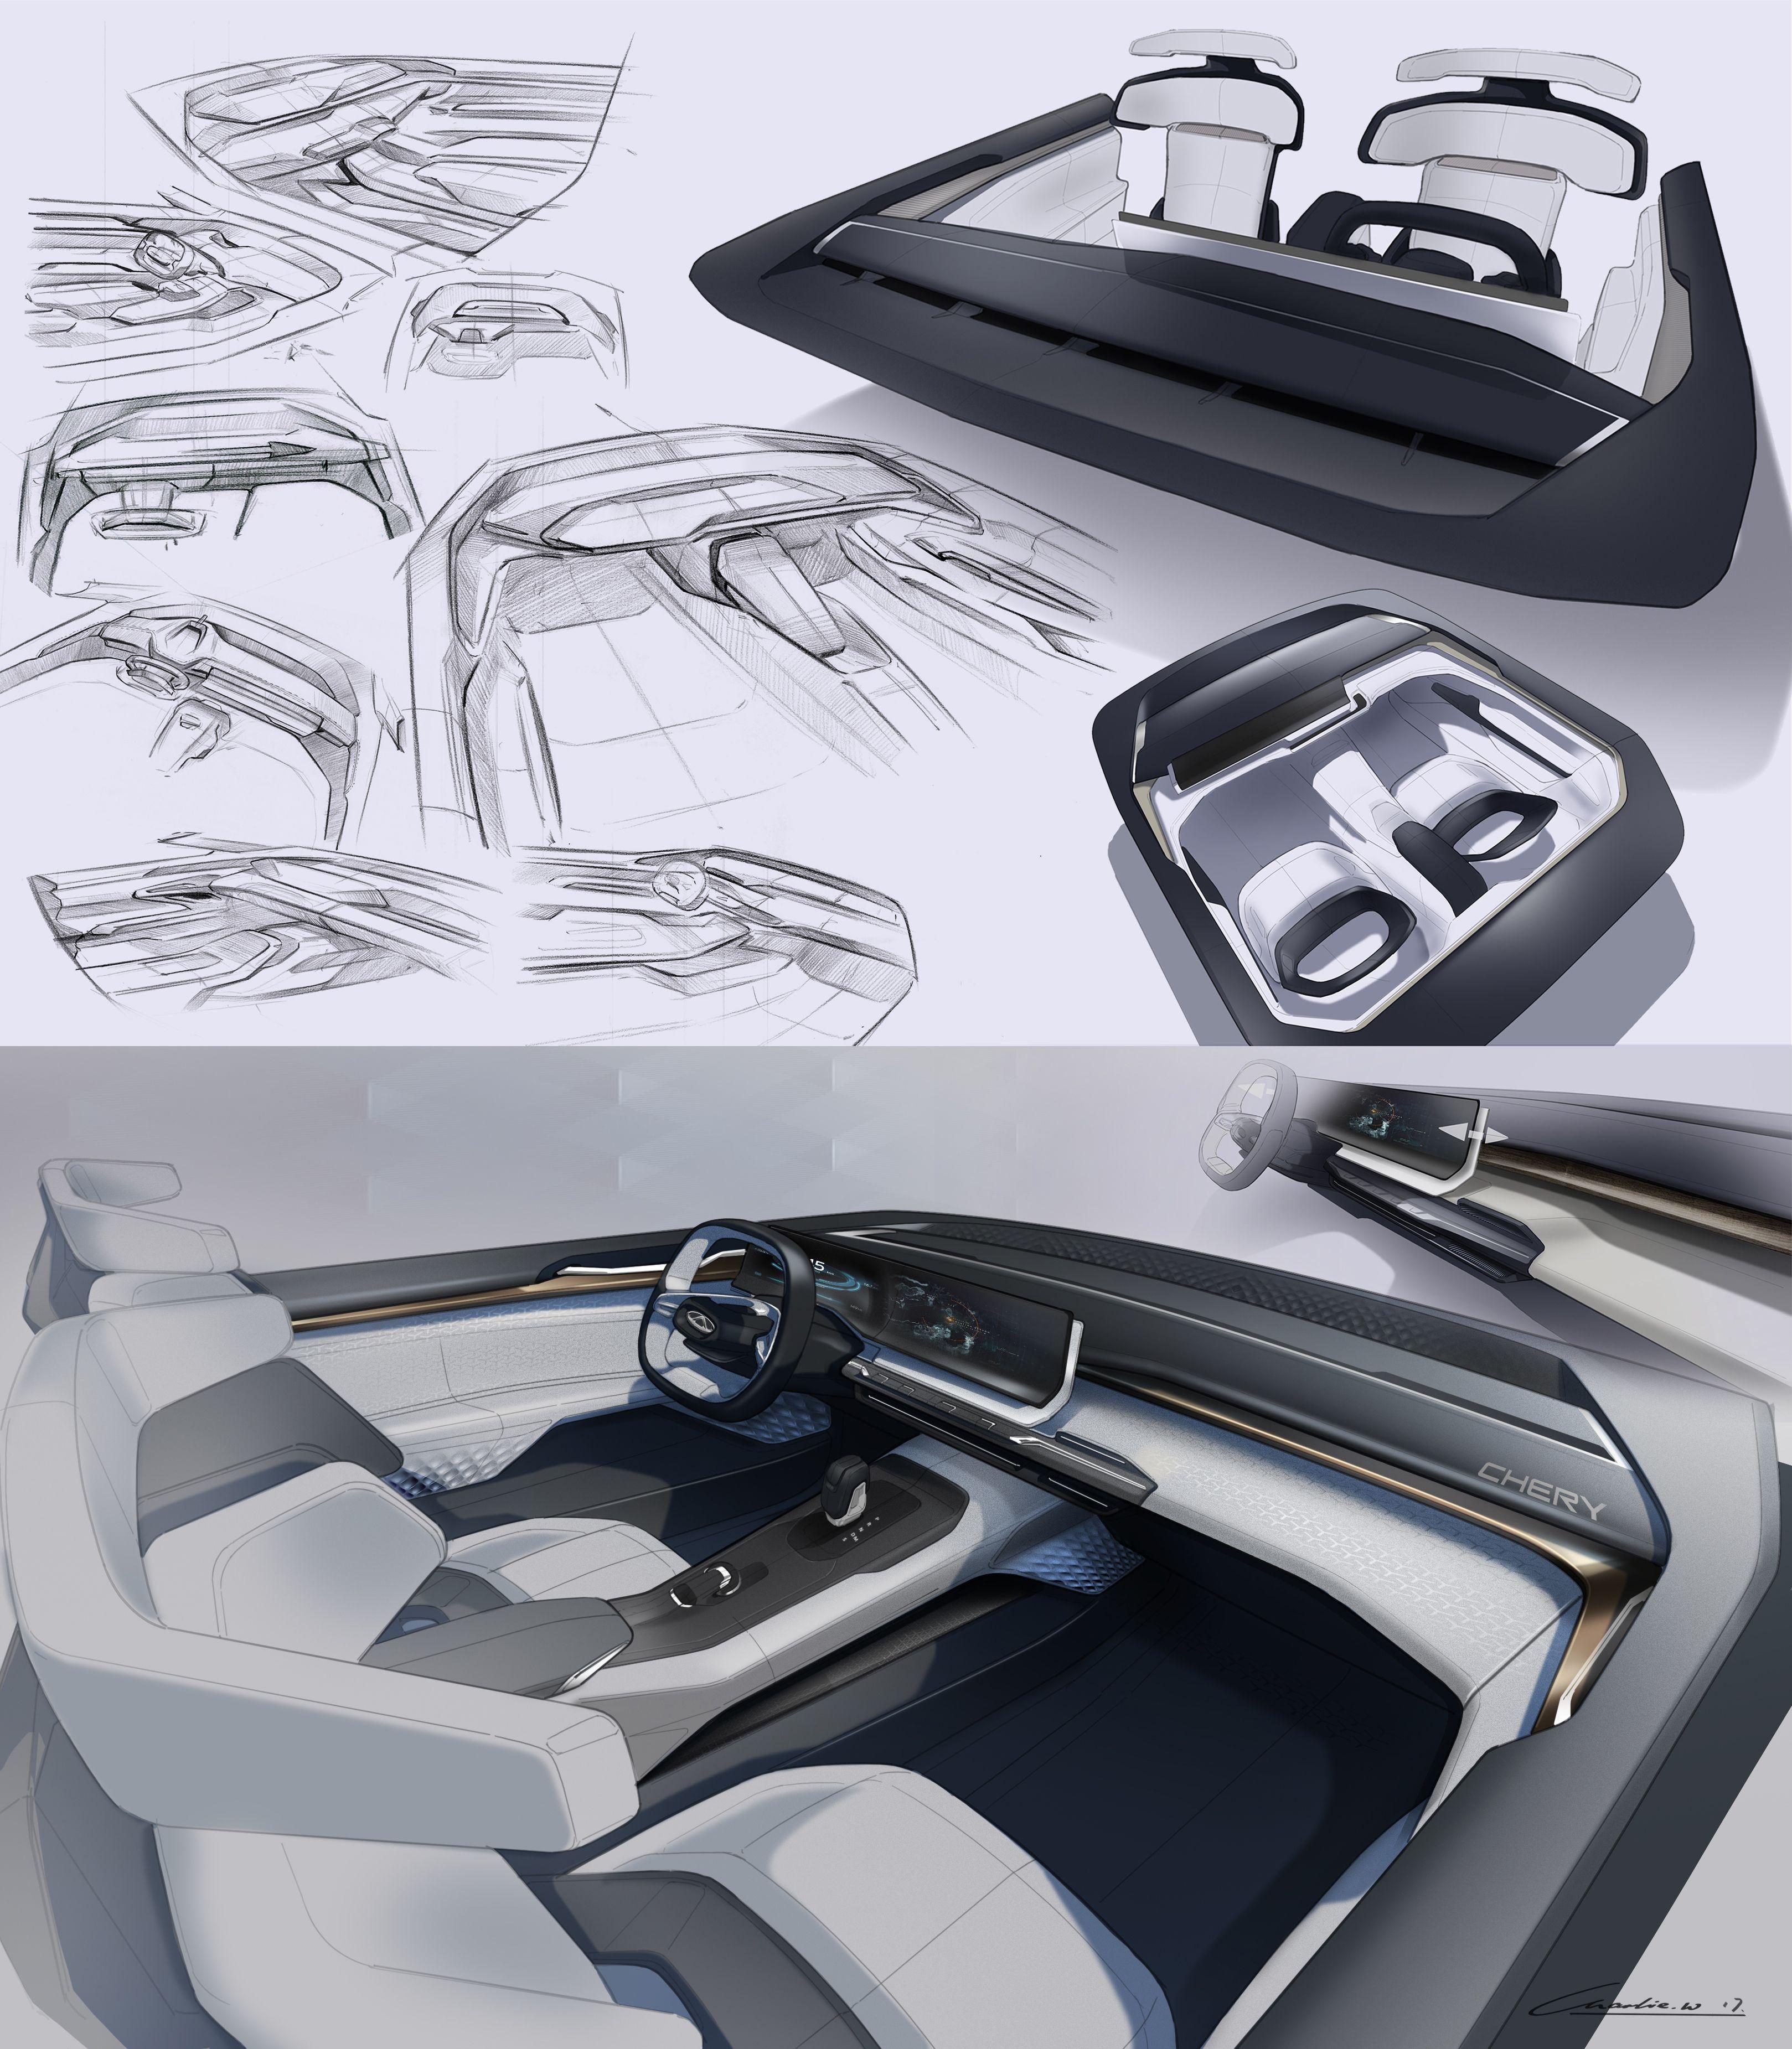 Chery Brand New Tiggo Coupe Concept Interior Design Sketches